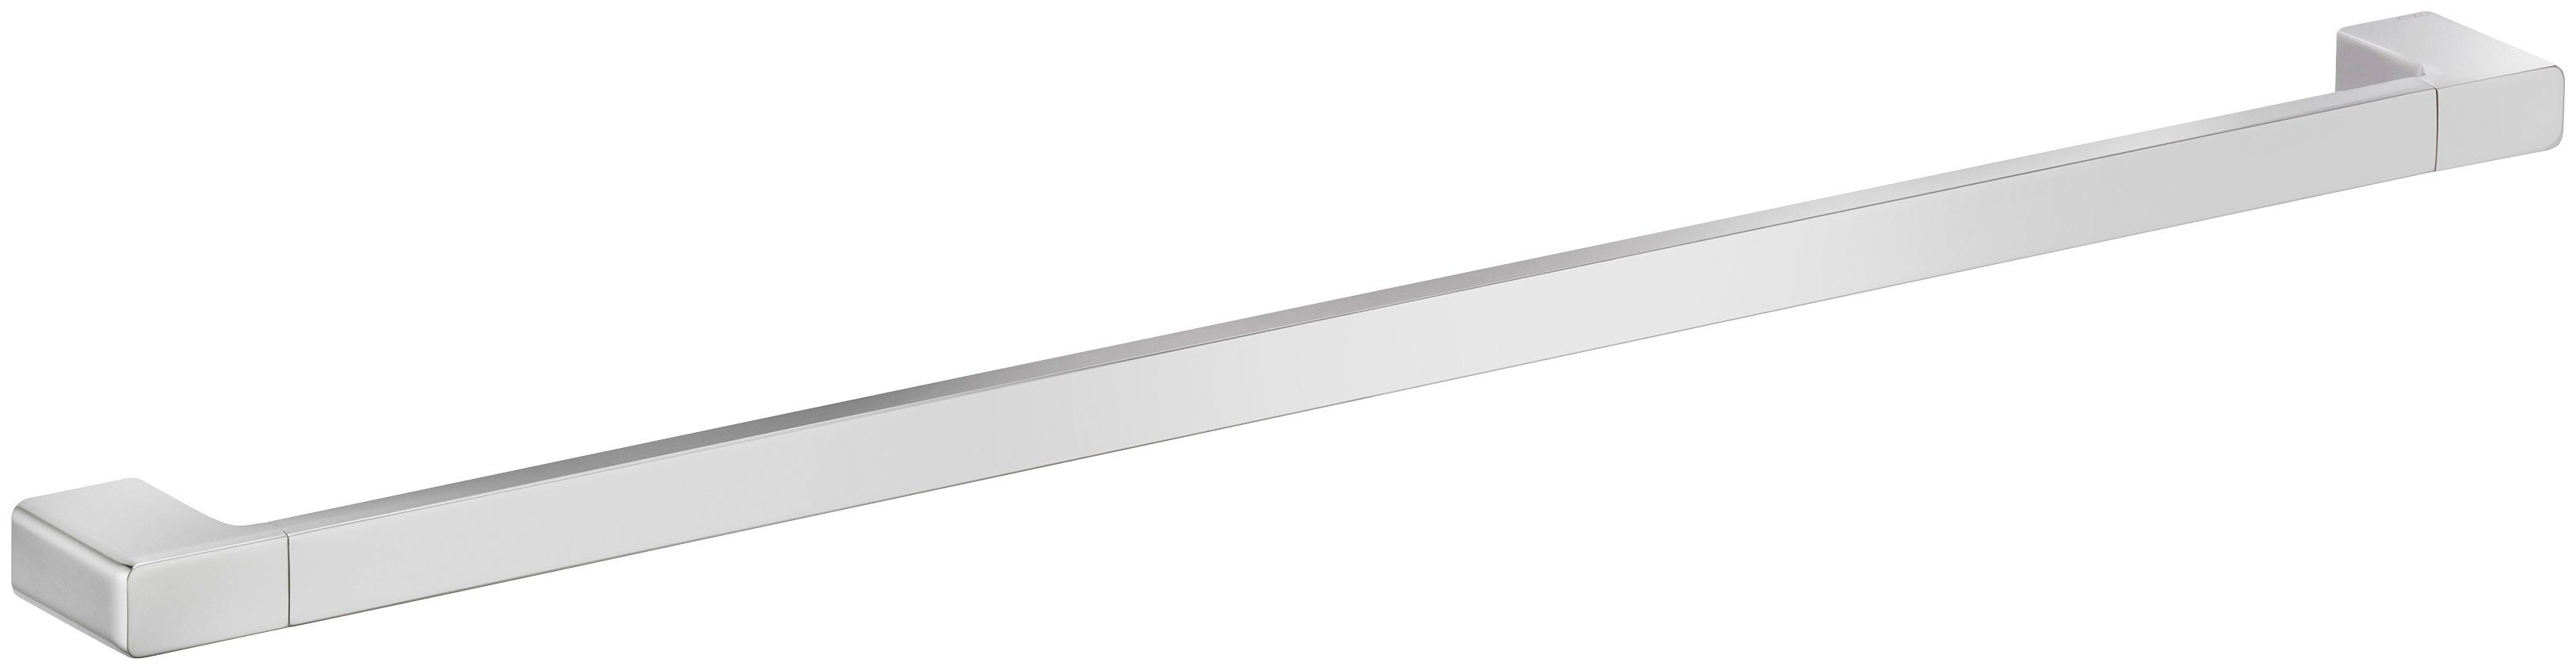 KEUCO Handtuchhalter »Collection Moll«, Badetuchhalter 400mm verchromt